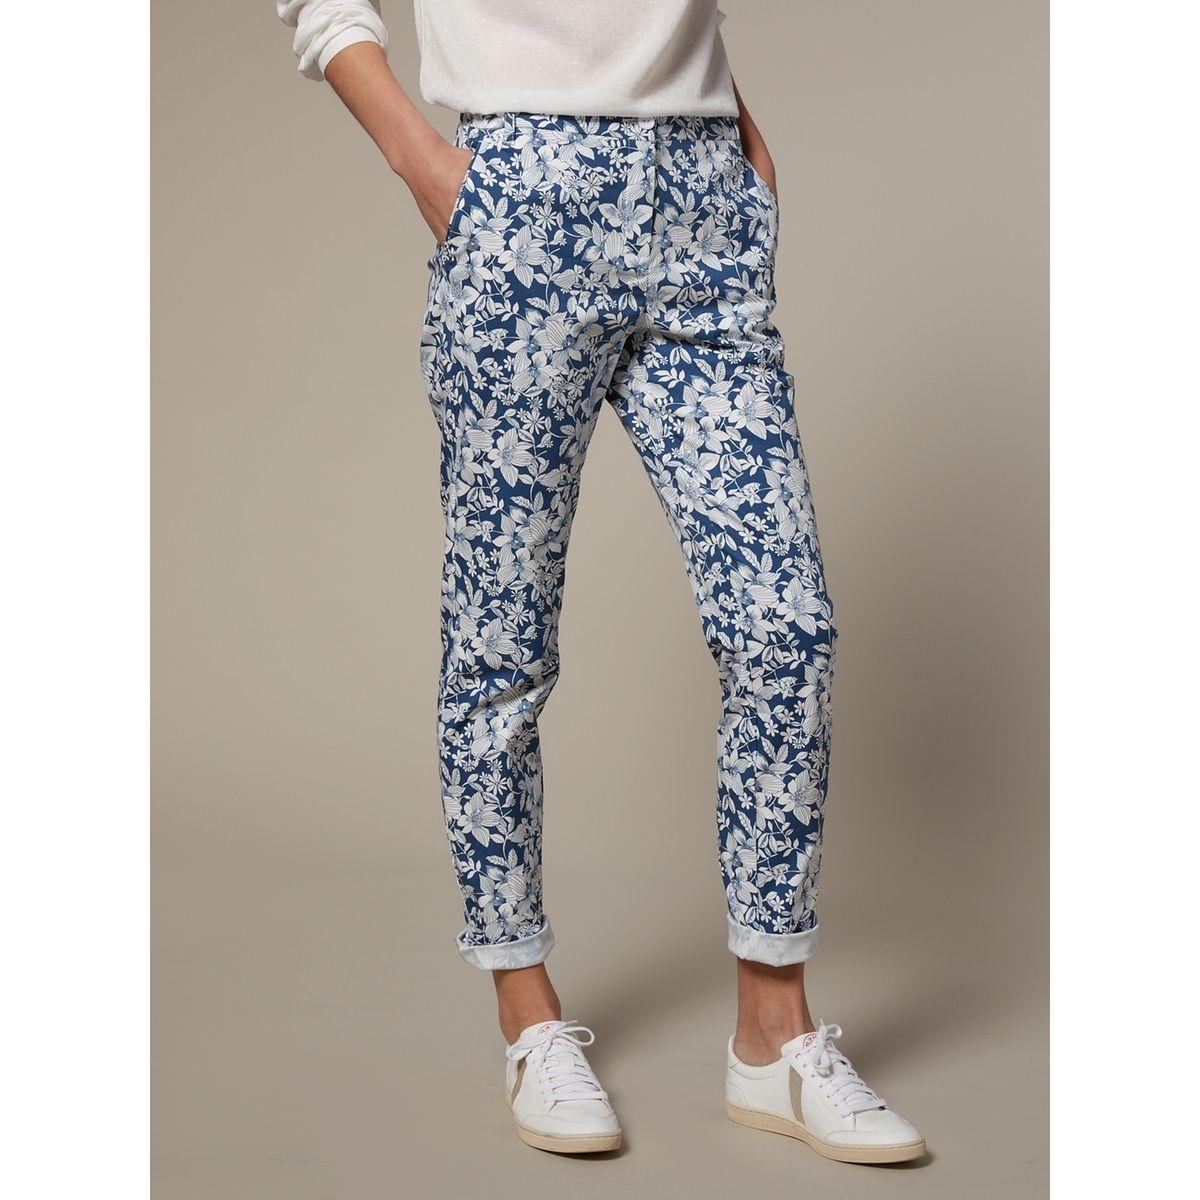 7c05fe8a19 Pantalon chino CYRILLUS 𝗽𝗮𝘀 𝗰𝗵𝗲𝗿 - Mes Fringues